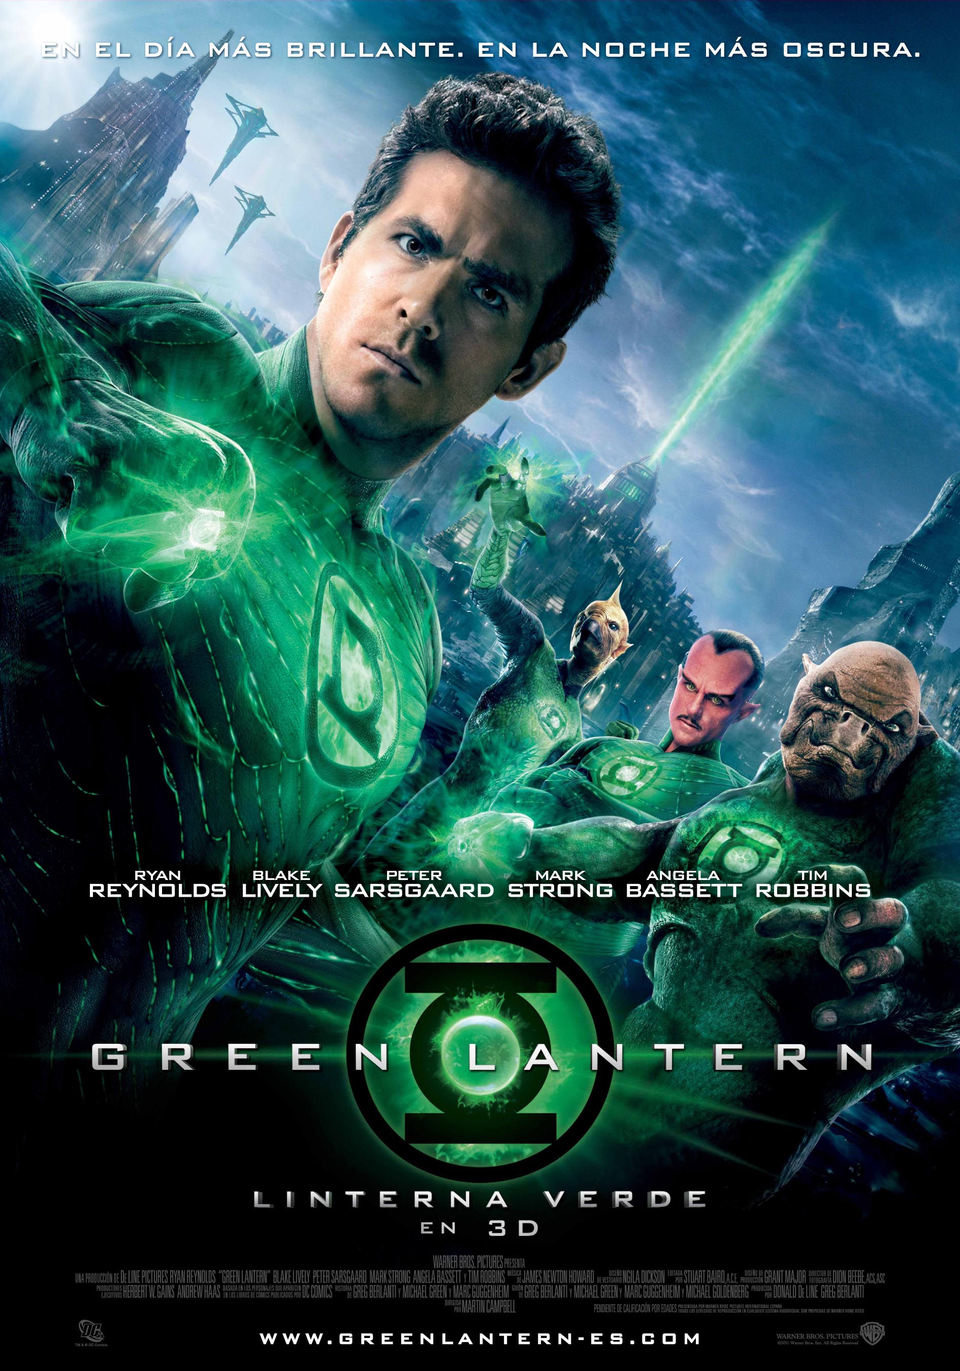 Linterna Verde póster